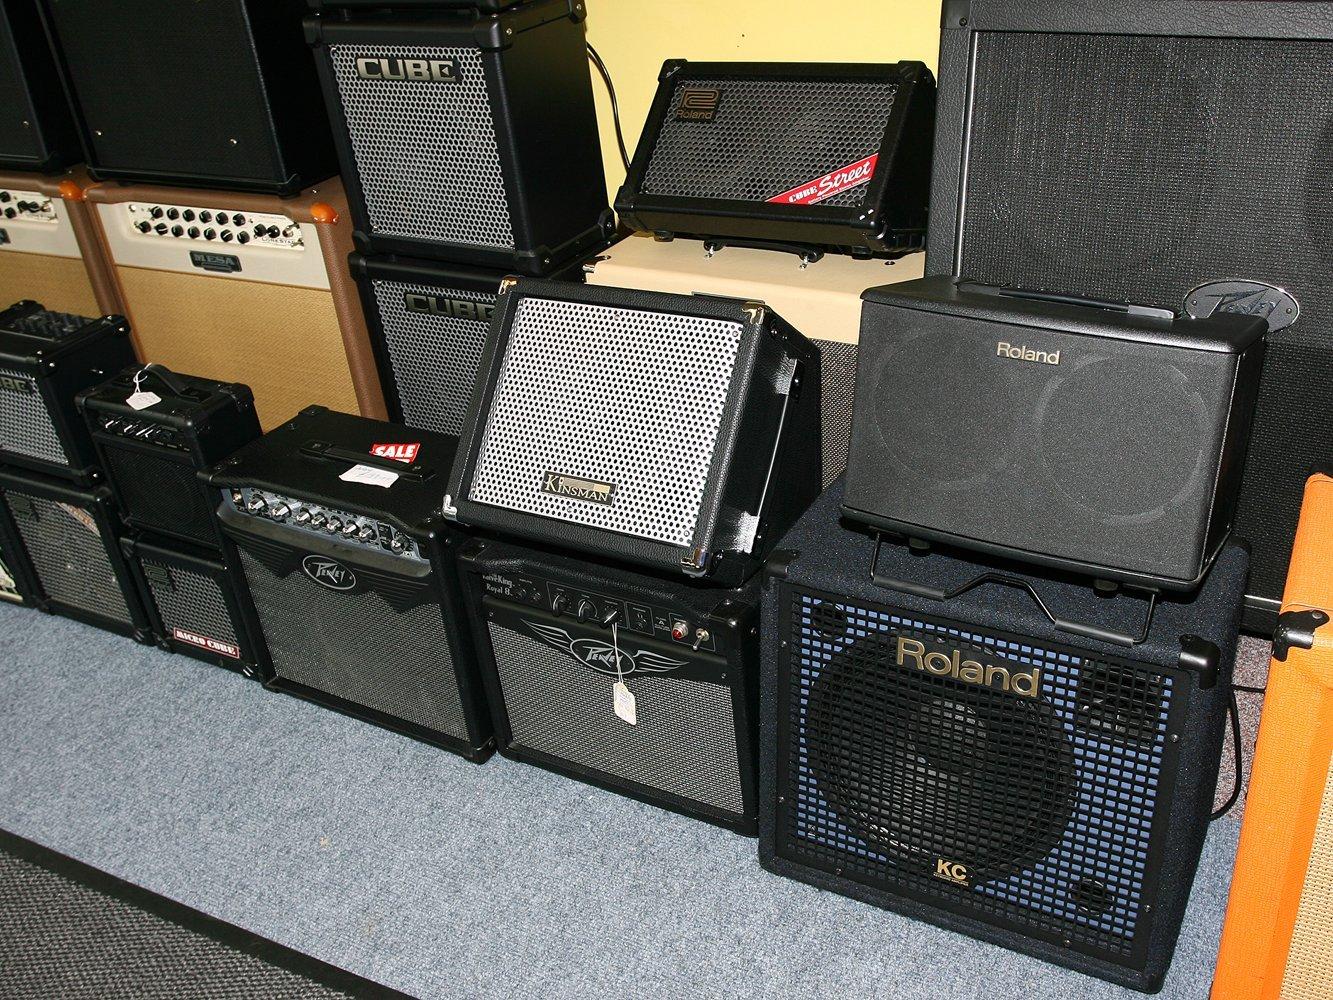 Roland speakers